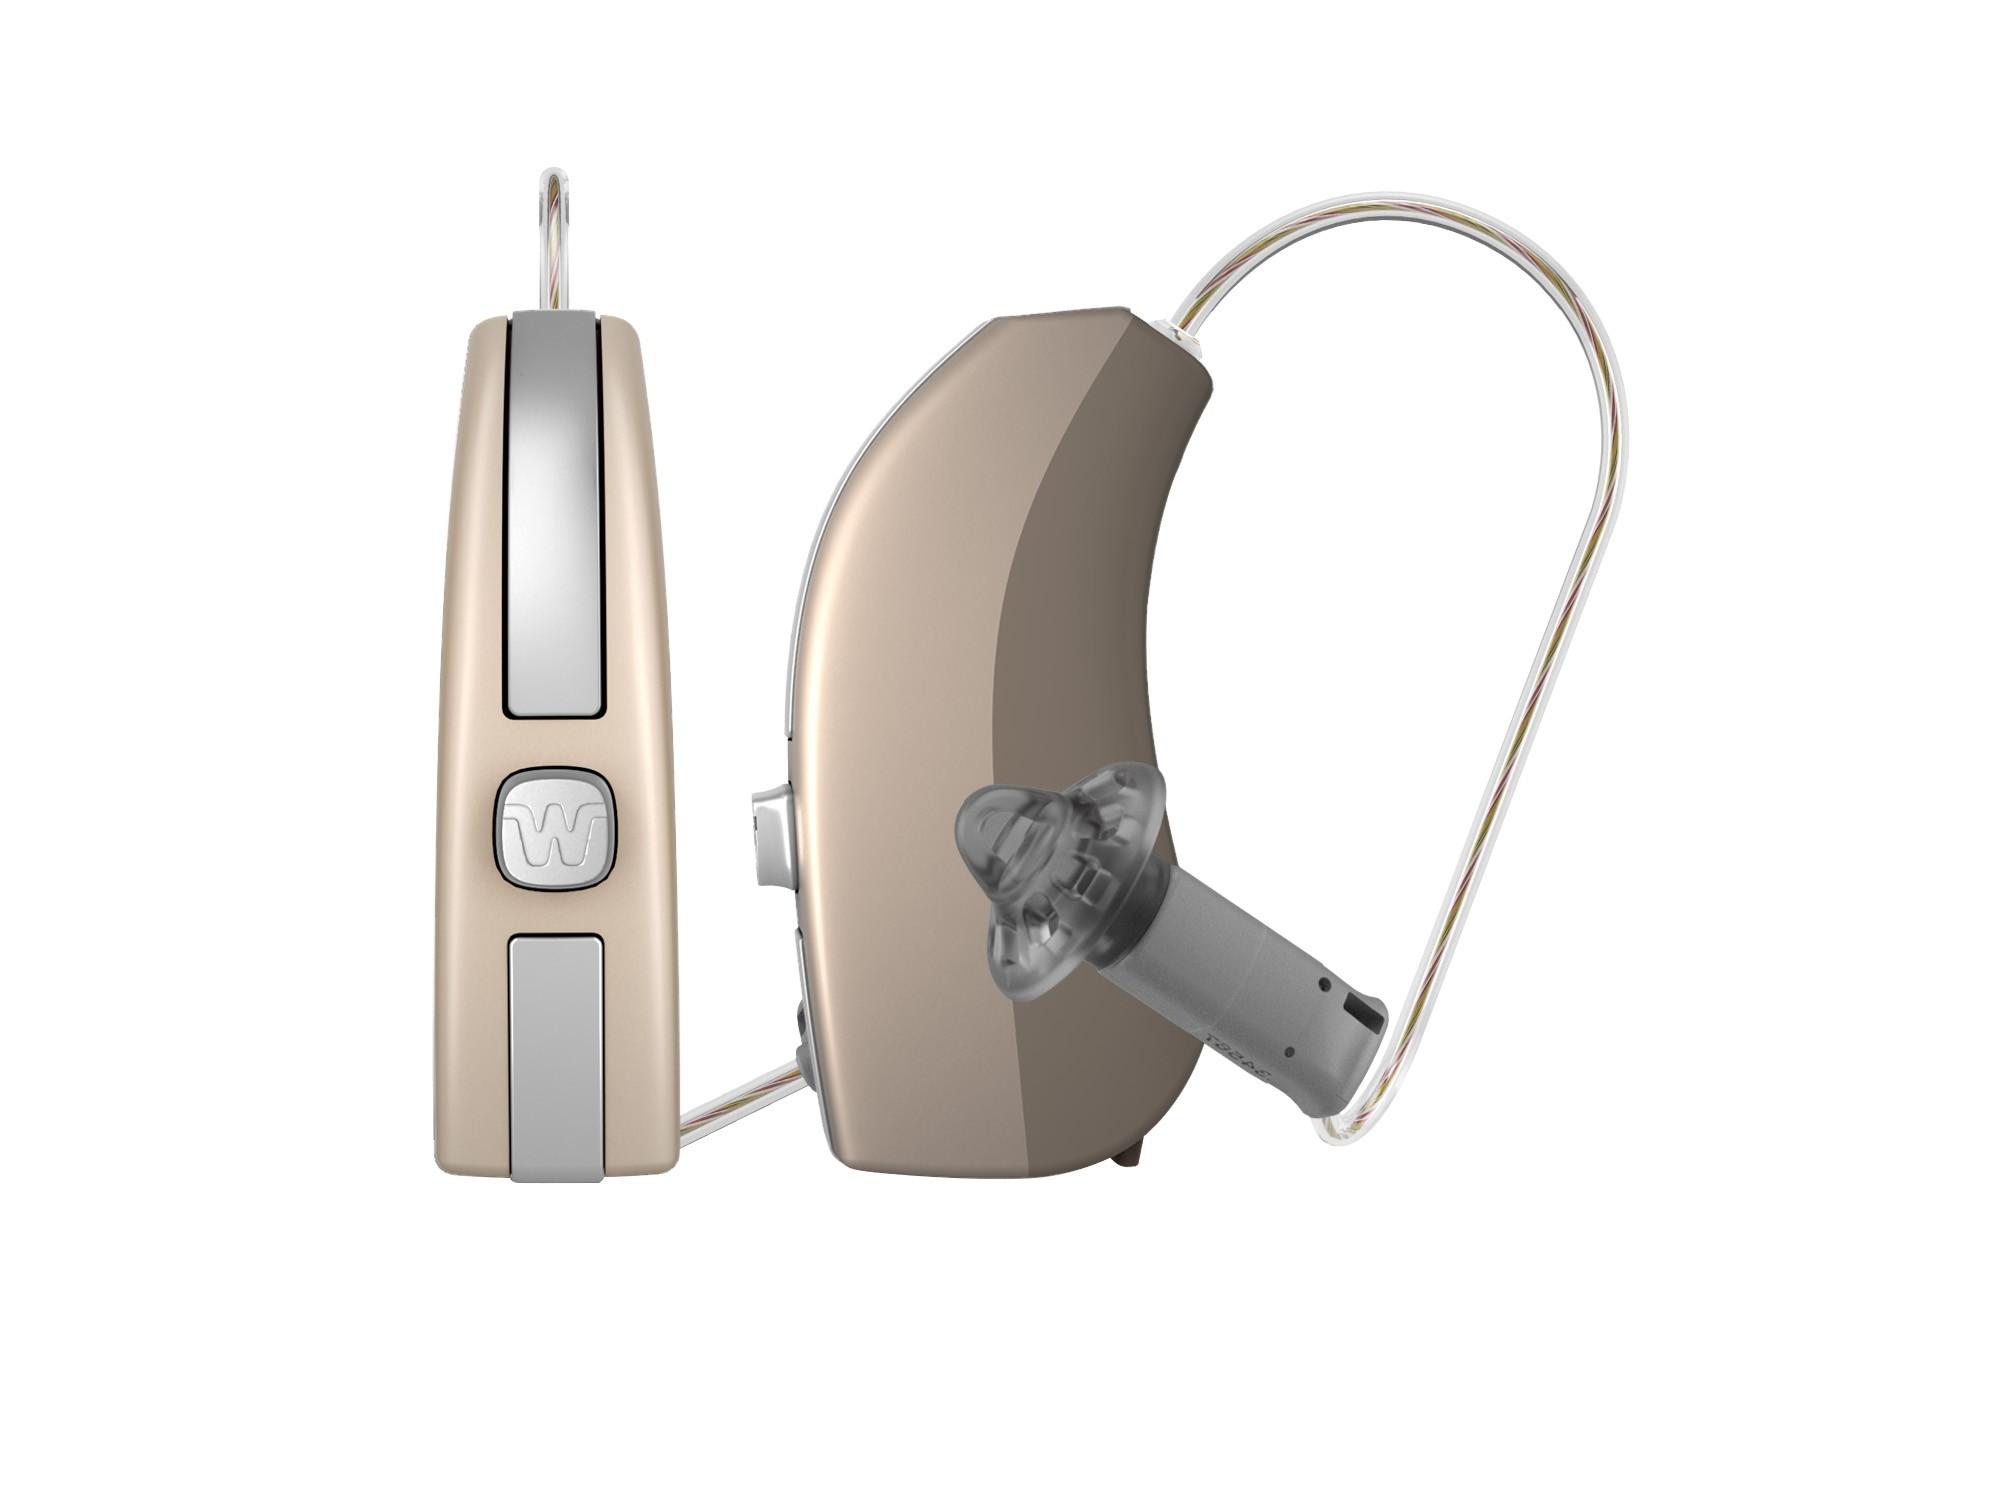 Widex Beyond 110 Hearing Aid